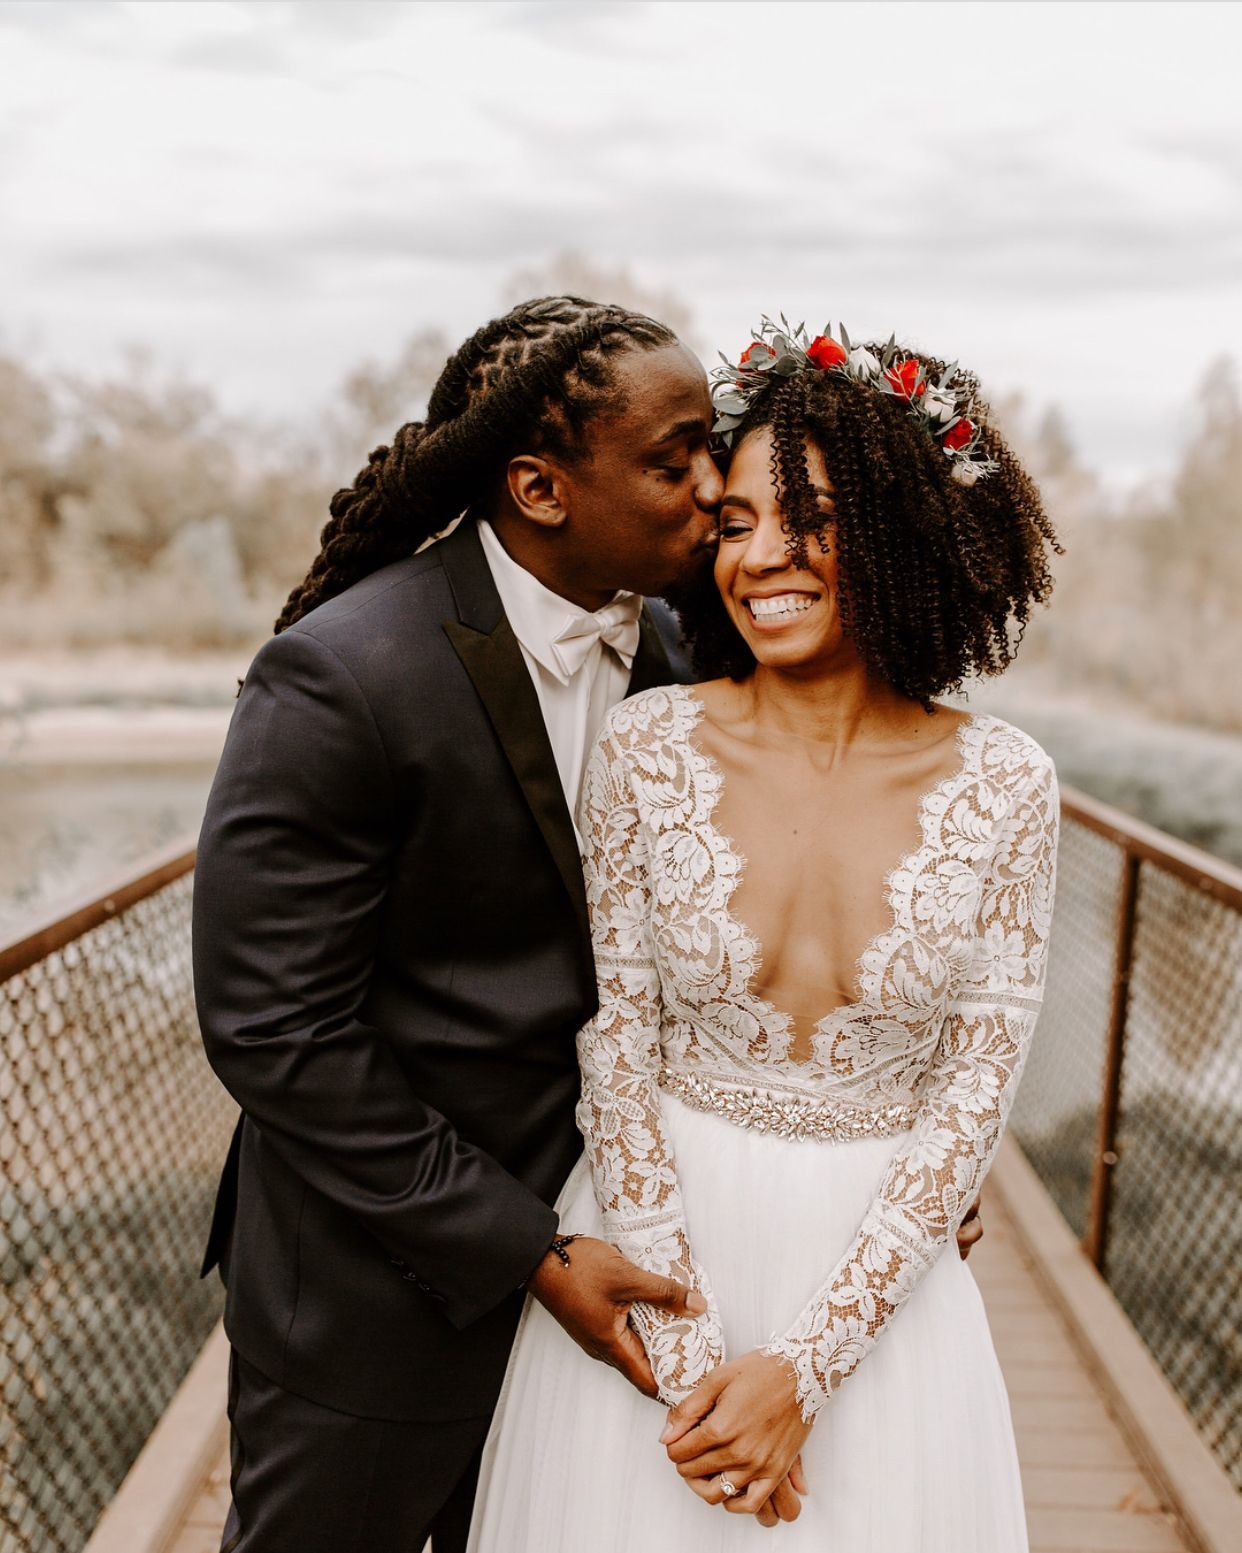 Gucci mane wife wedding dress  Pin by Christian Briana  on Dear Future Husband  Pinterest